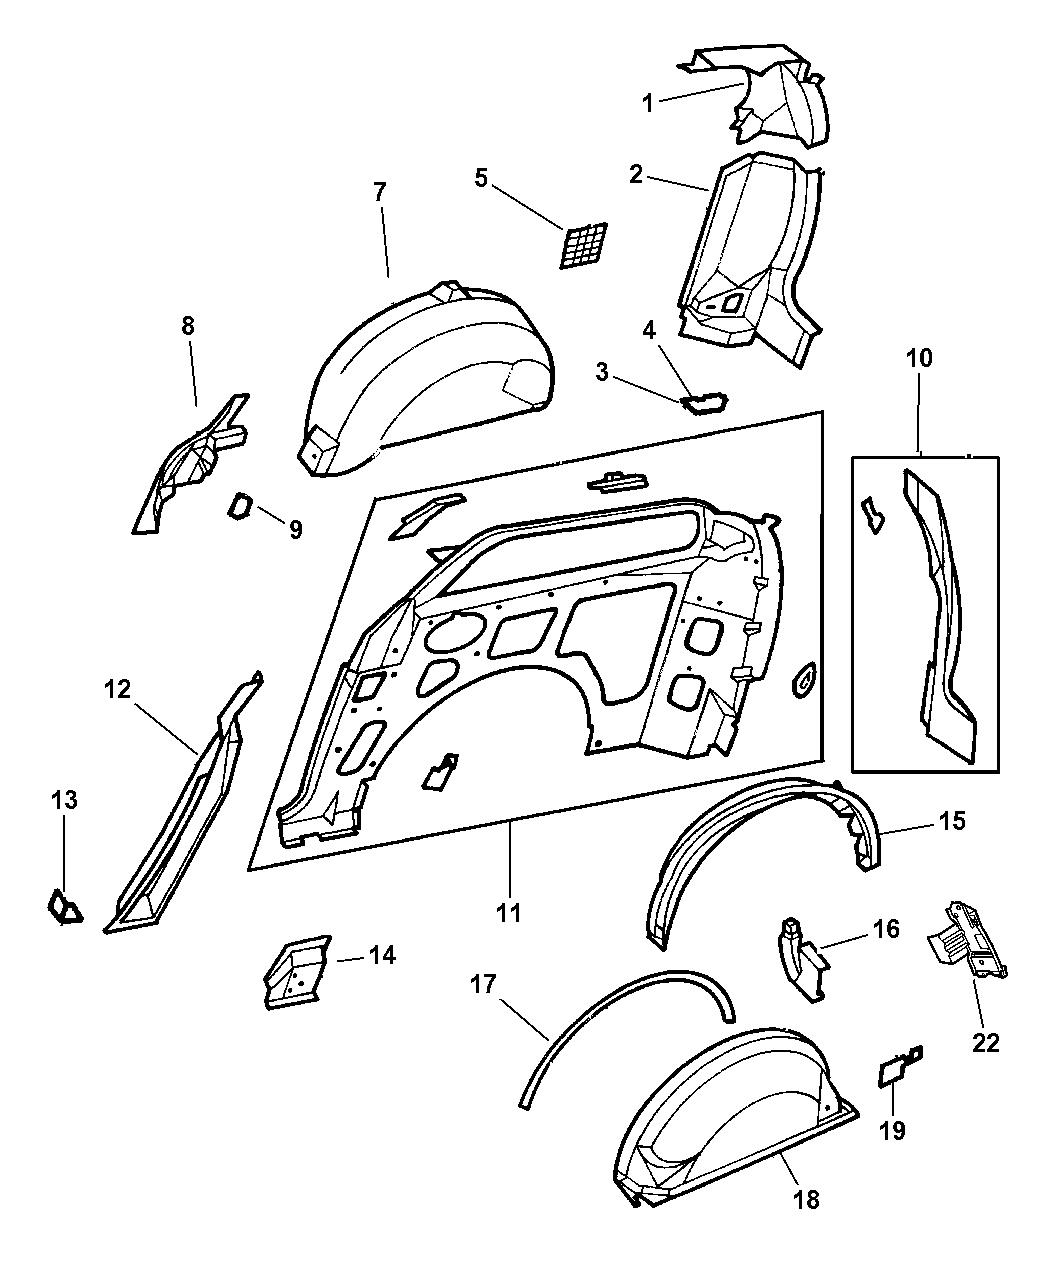 How To Remove Sliding Door Panel On Dodge Caravan: 1997 Dodge Caravan Quarter Panel With Sliding Door Inner